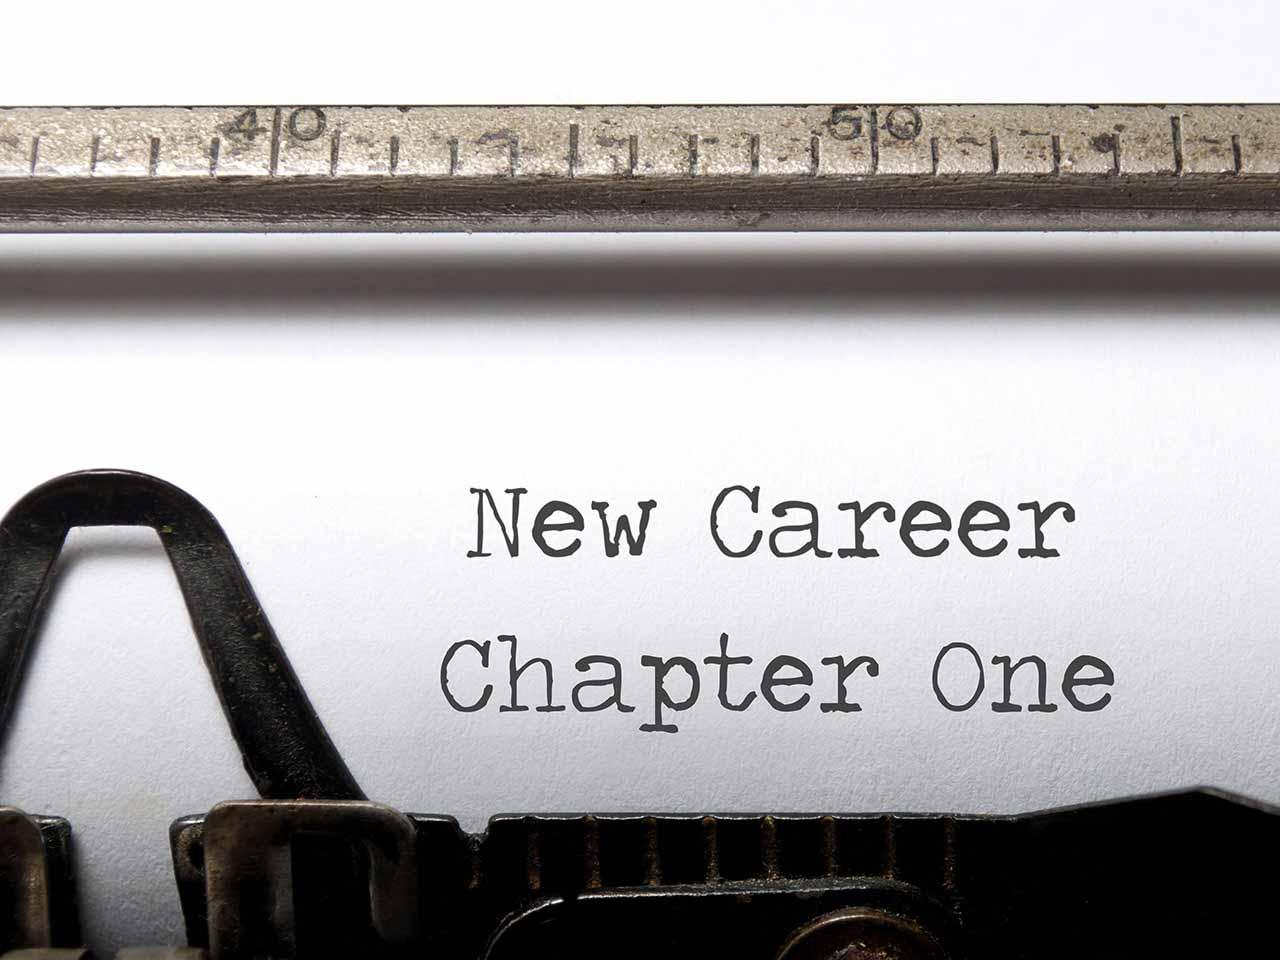 changing-career-at-50-plus.jpg